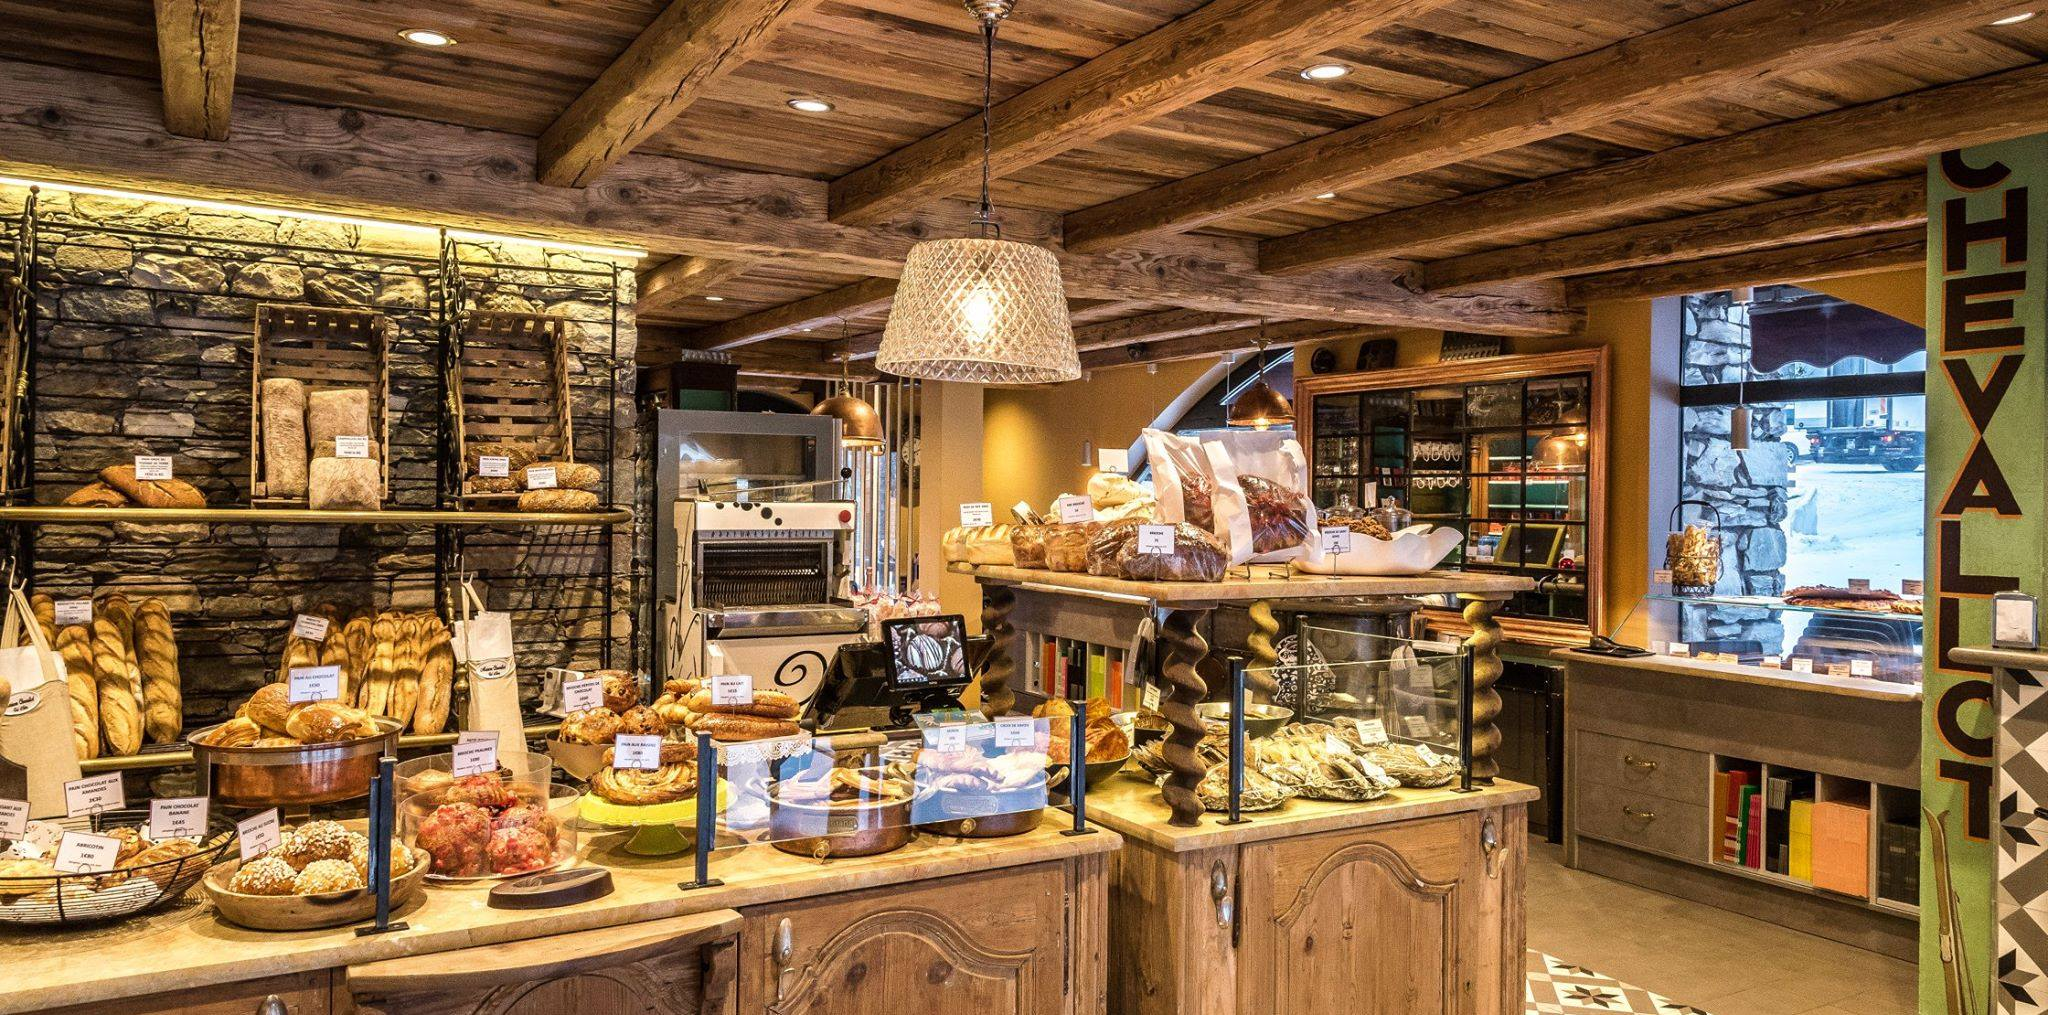 Boulangerie de Patrick Chevallot